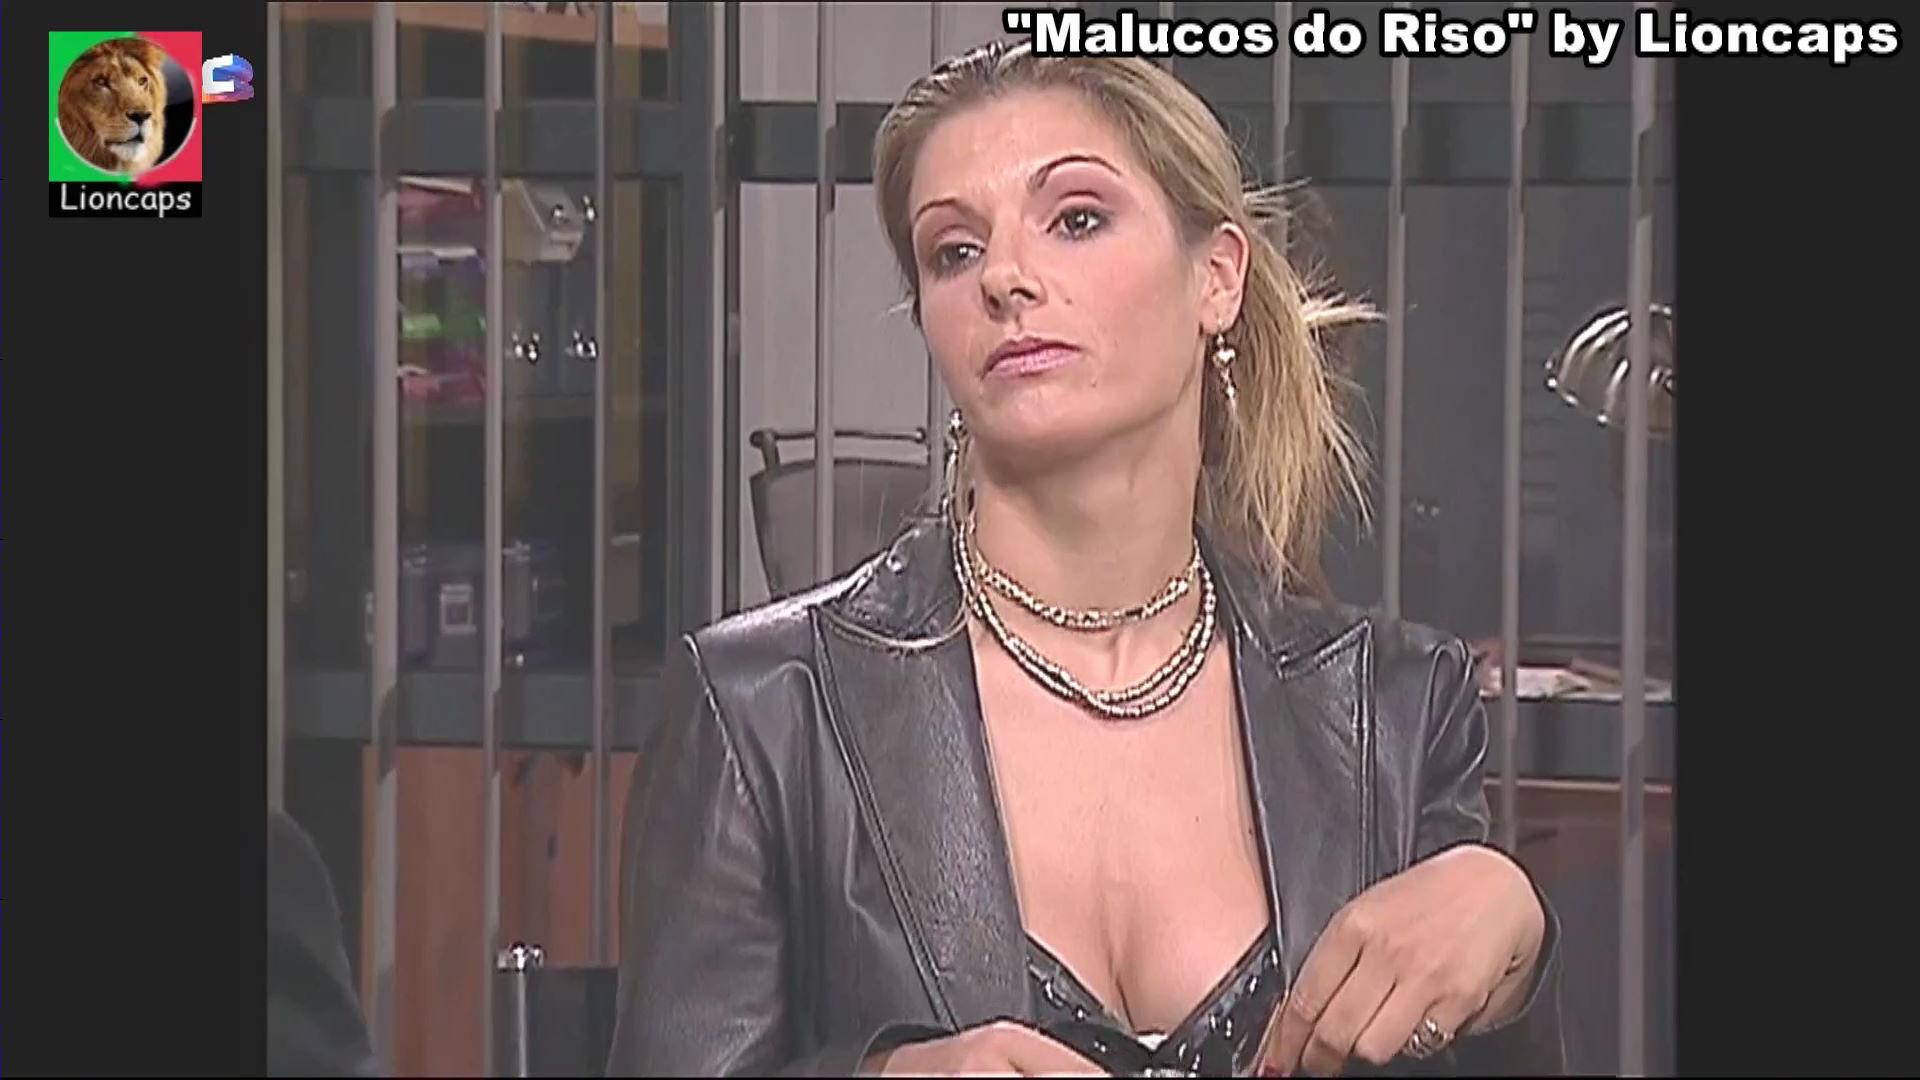 475154578_malucos_riso_alda_gomes_vs190malucos_riso_602_15064_122_410lo.JPG